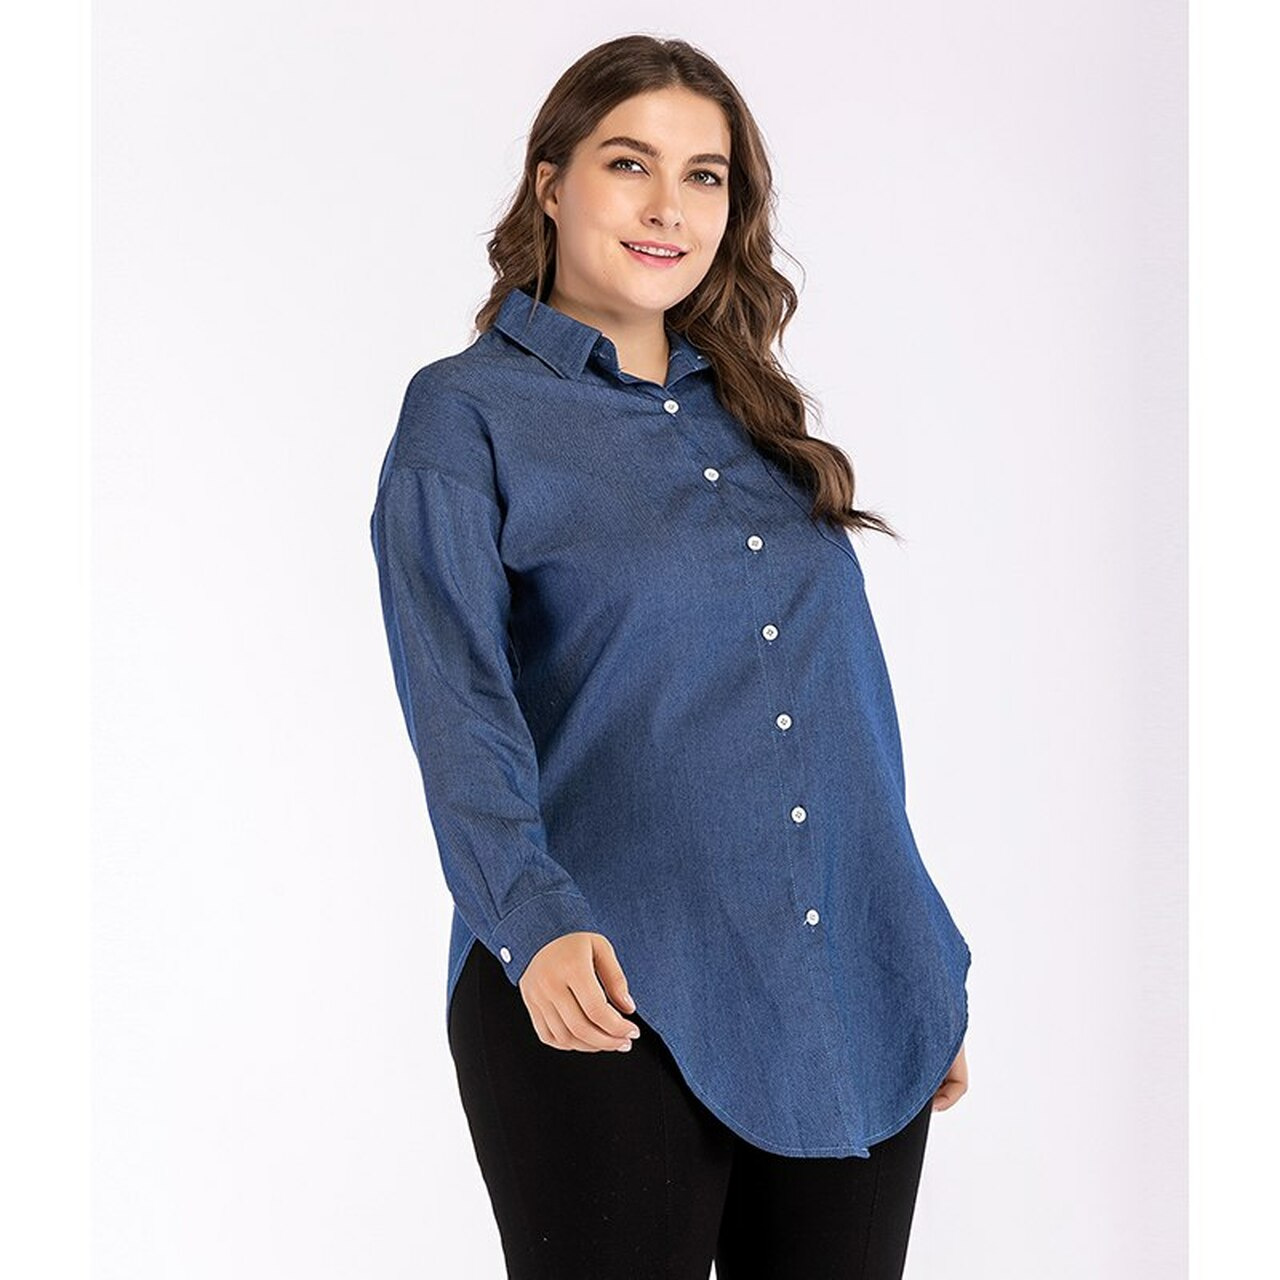 db4ee59c5c ... Blue Irregular Plus Size Denim Shirt Female 2018 Autumn Women Vintage  Long Sleeve Jeans Blouses Outerwear ...